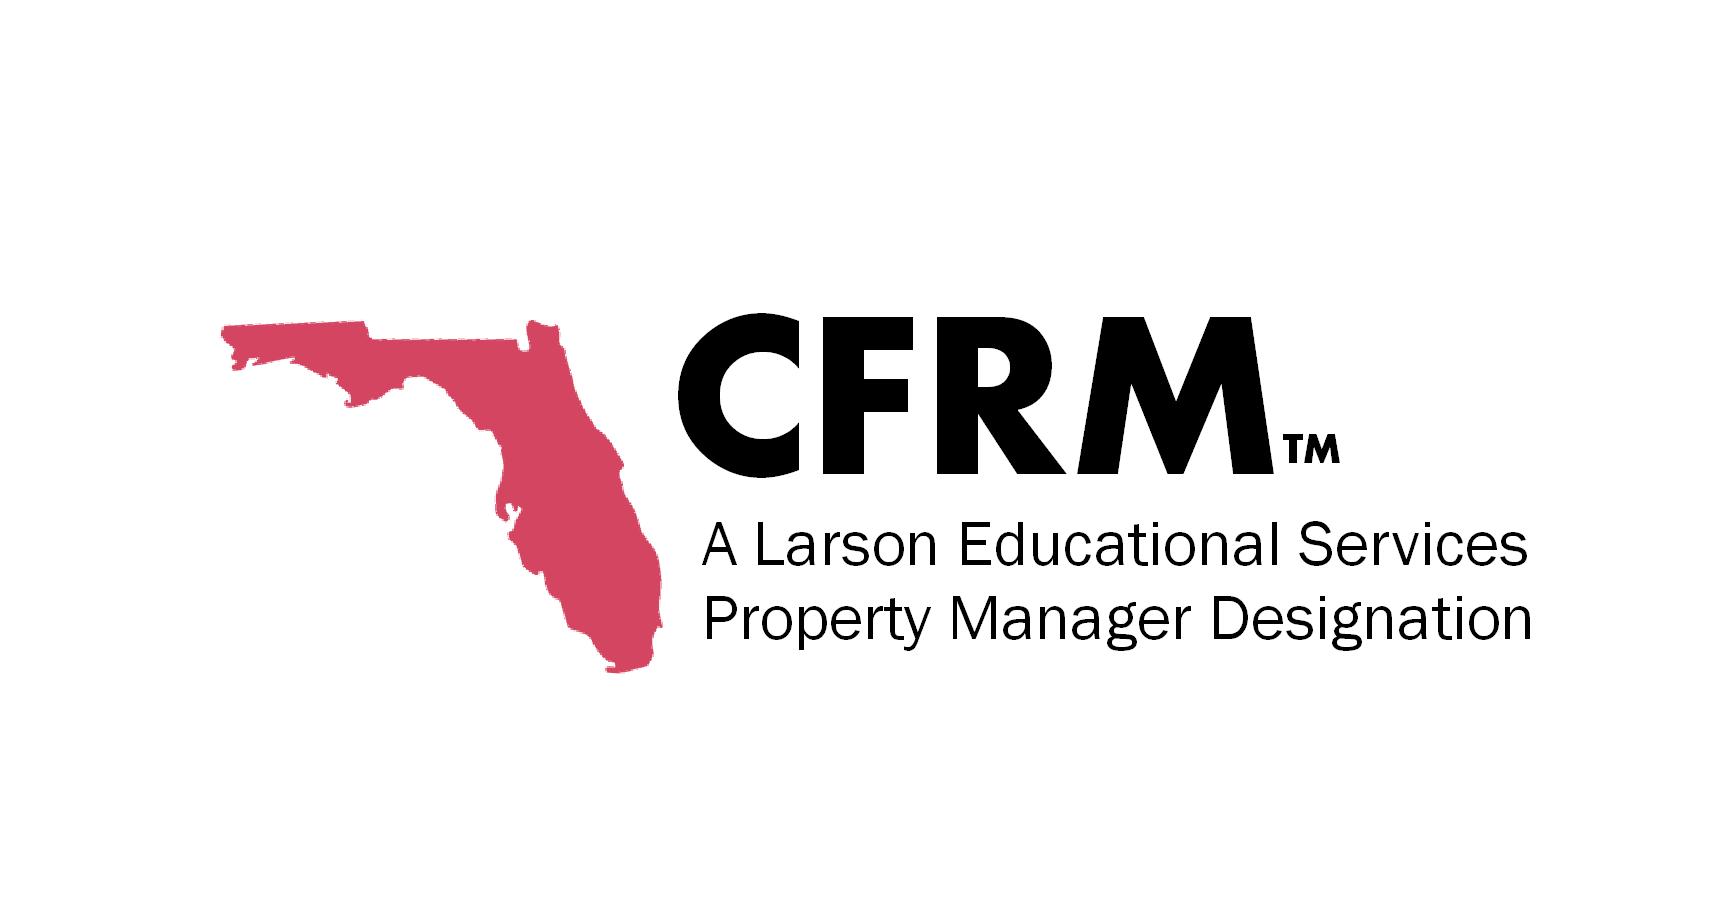 CFRM Logo small web 2